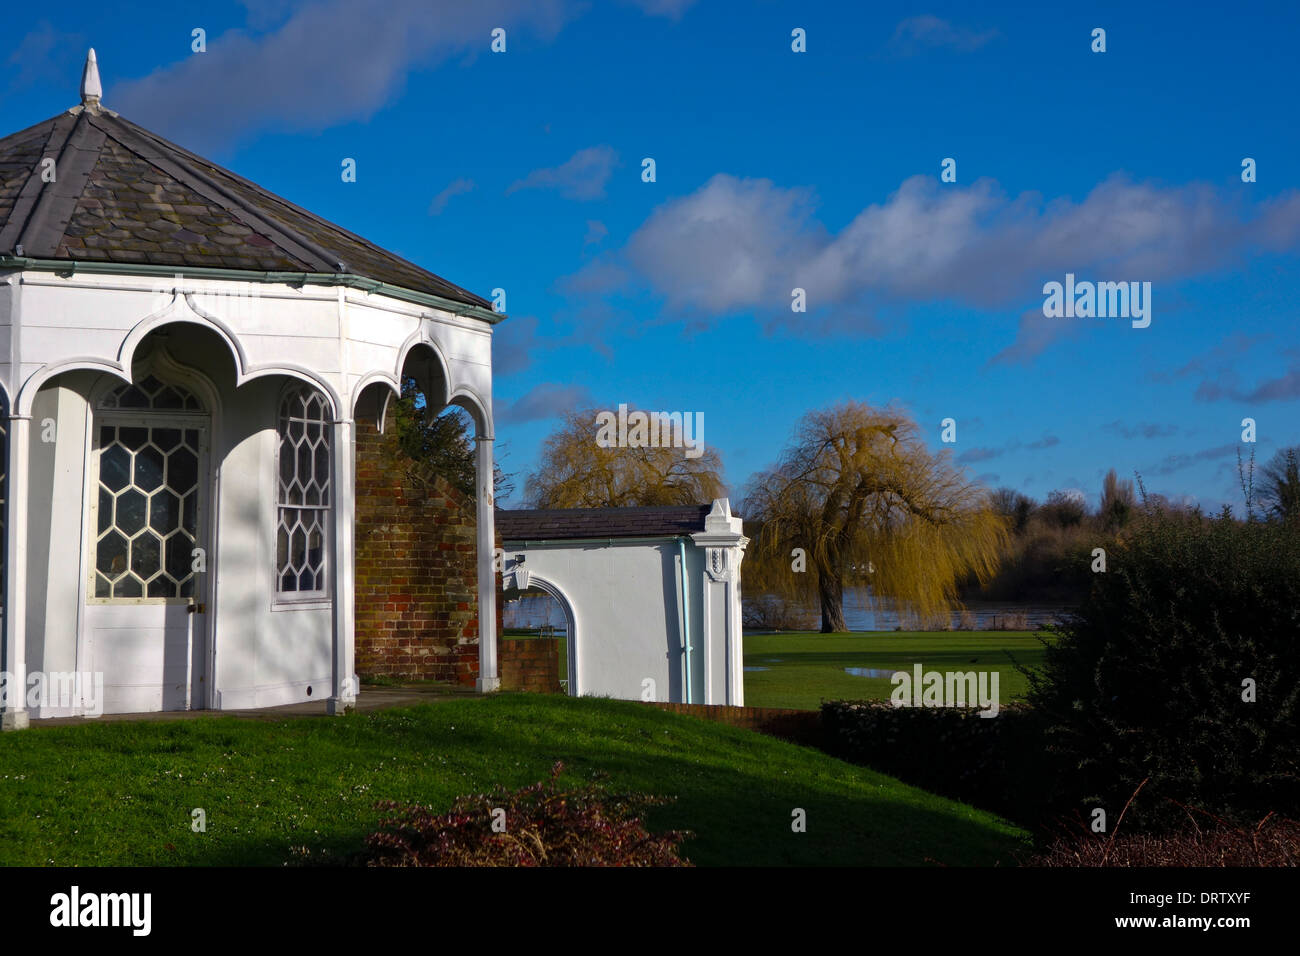 Radnor Gardens Strawberry Hill Twickenham England UK - Stock Image